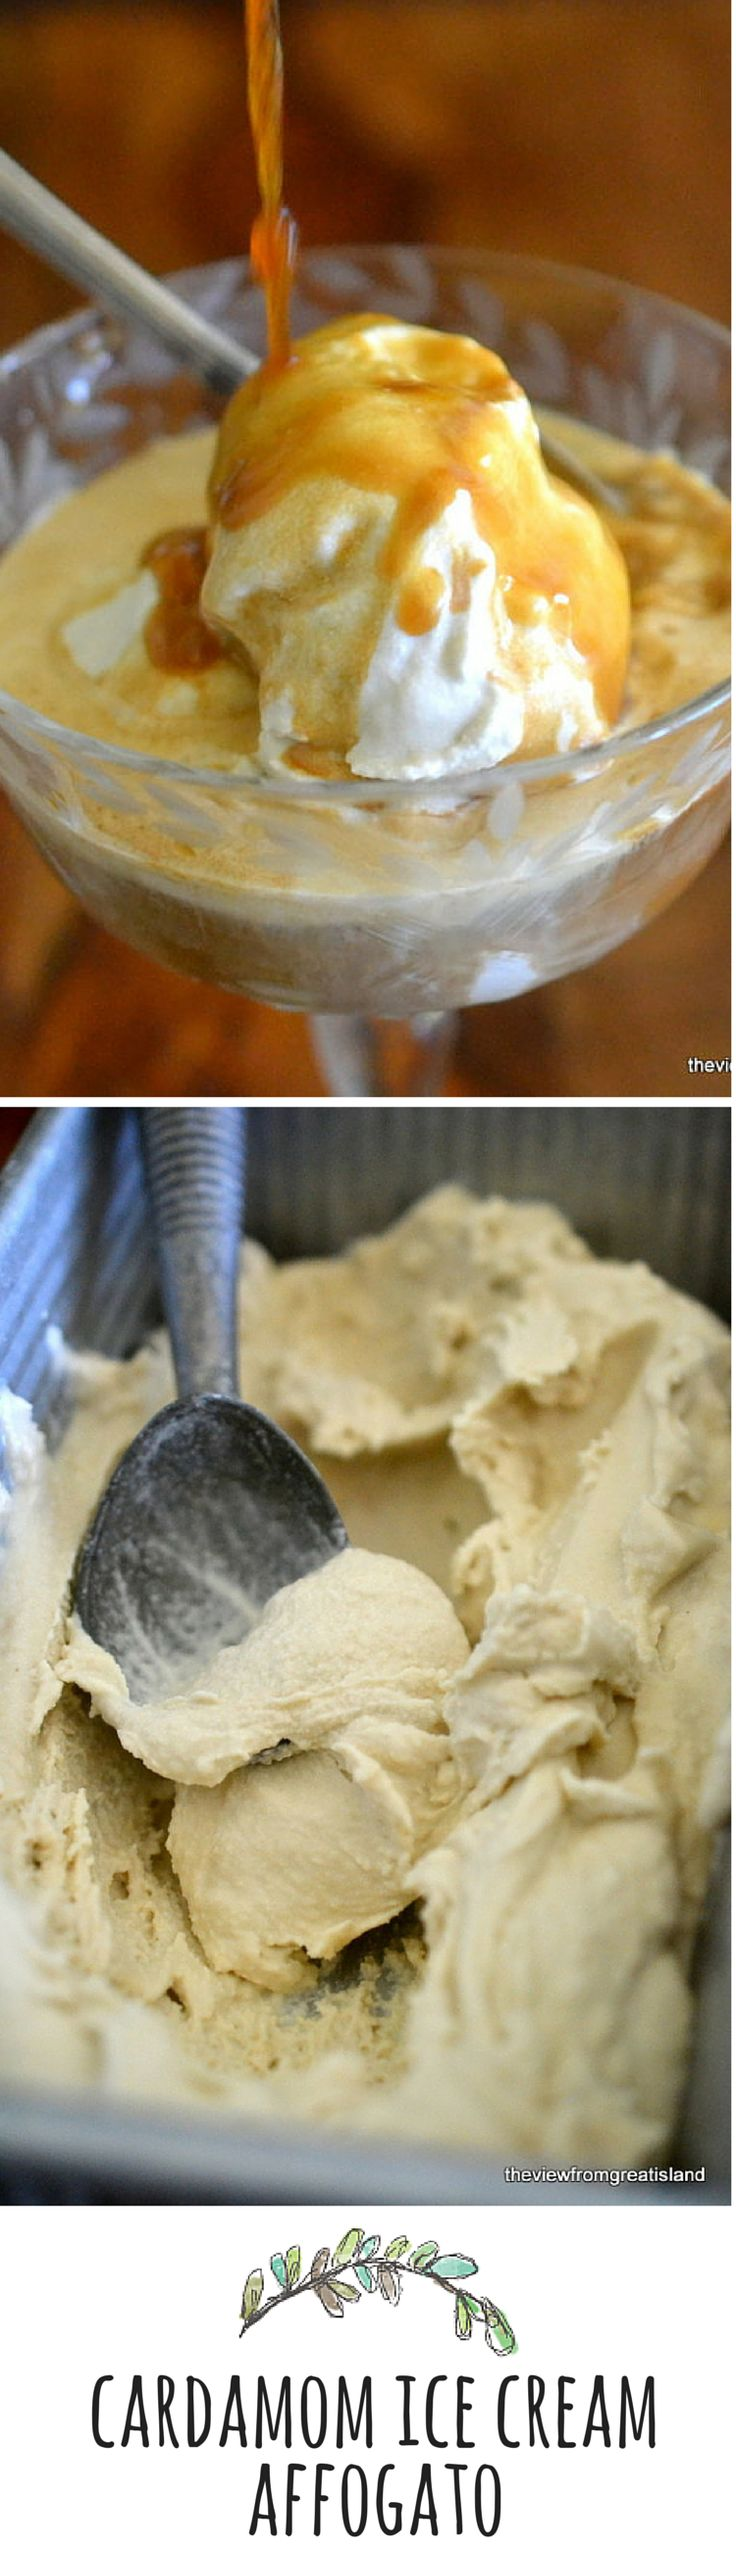 Homemade cardamom ice cream takes the Italian classic dessert (a shot of espresso poured over ice cream) to a new high!